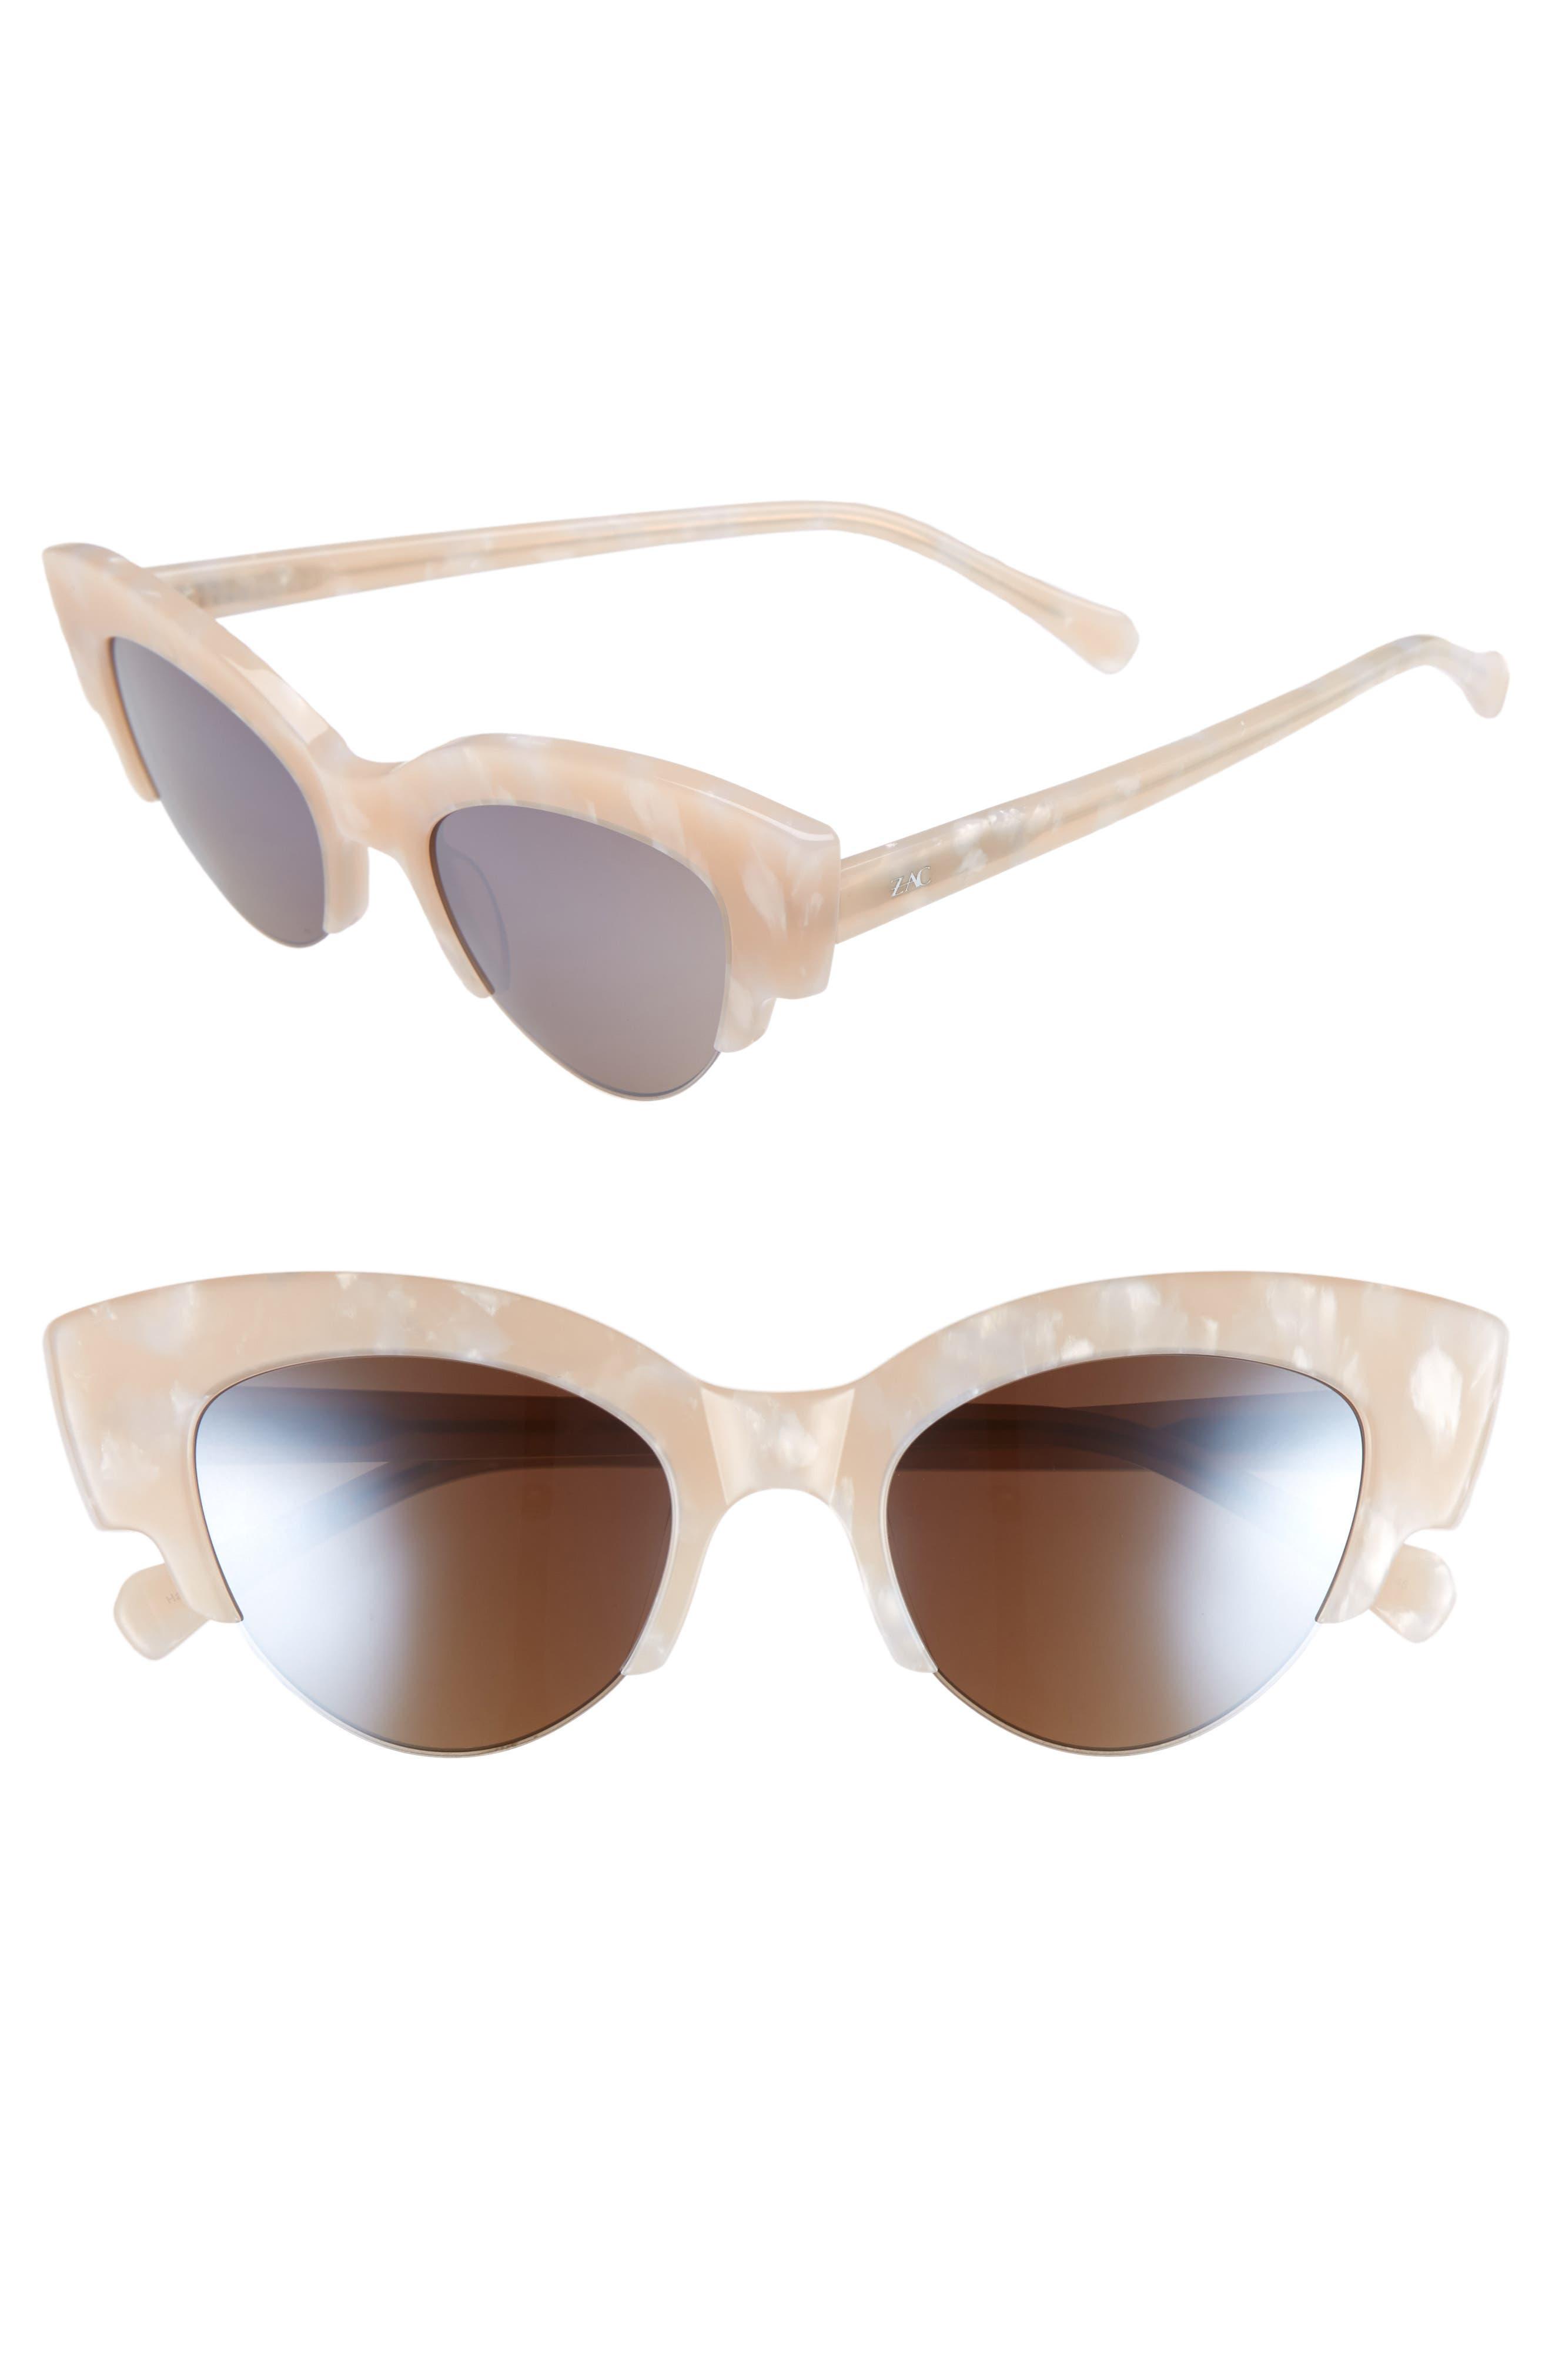 Winona Cat Eye Sunglasses,                             Main thumbnail 1, color,                             Marble/ Cream